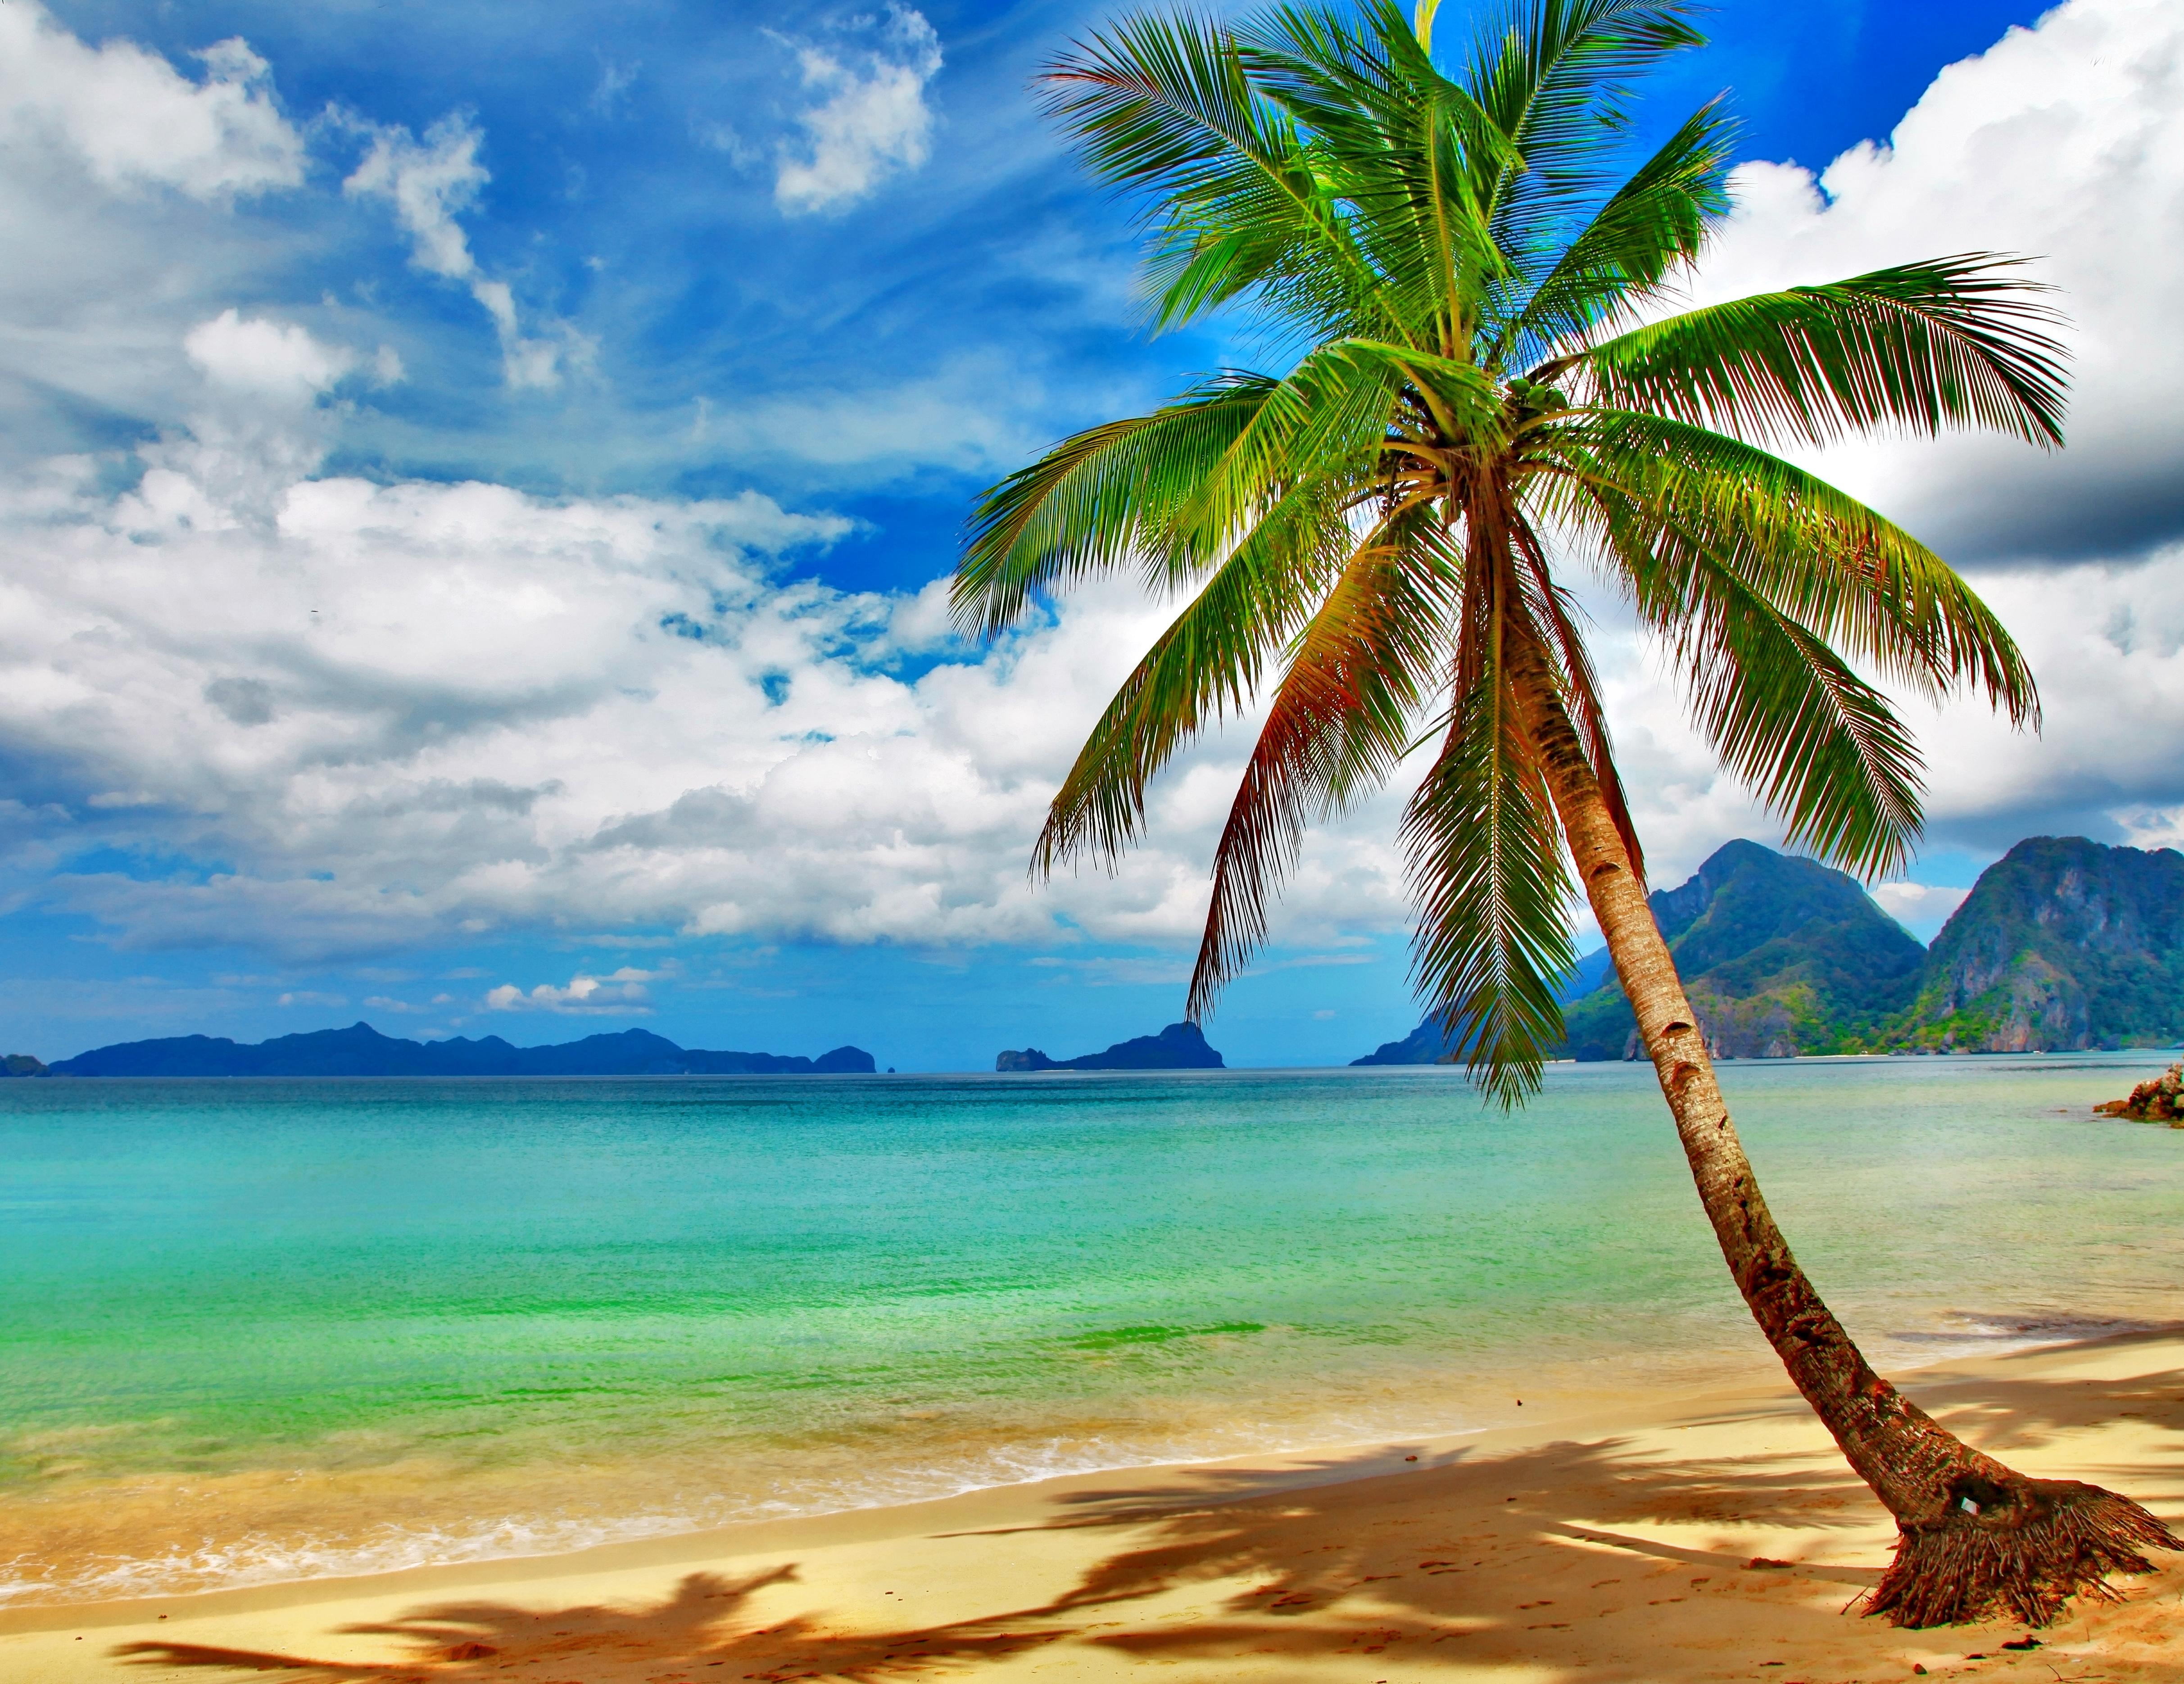 Hd Tropical Island Beach Paradise Wallpapers And Backgrounds: Tropical Beach Desktop Wallpaper